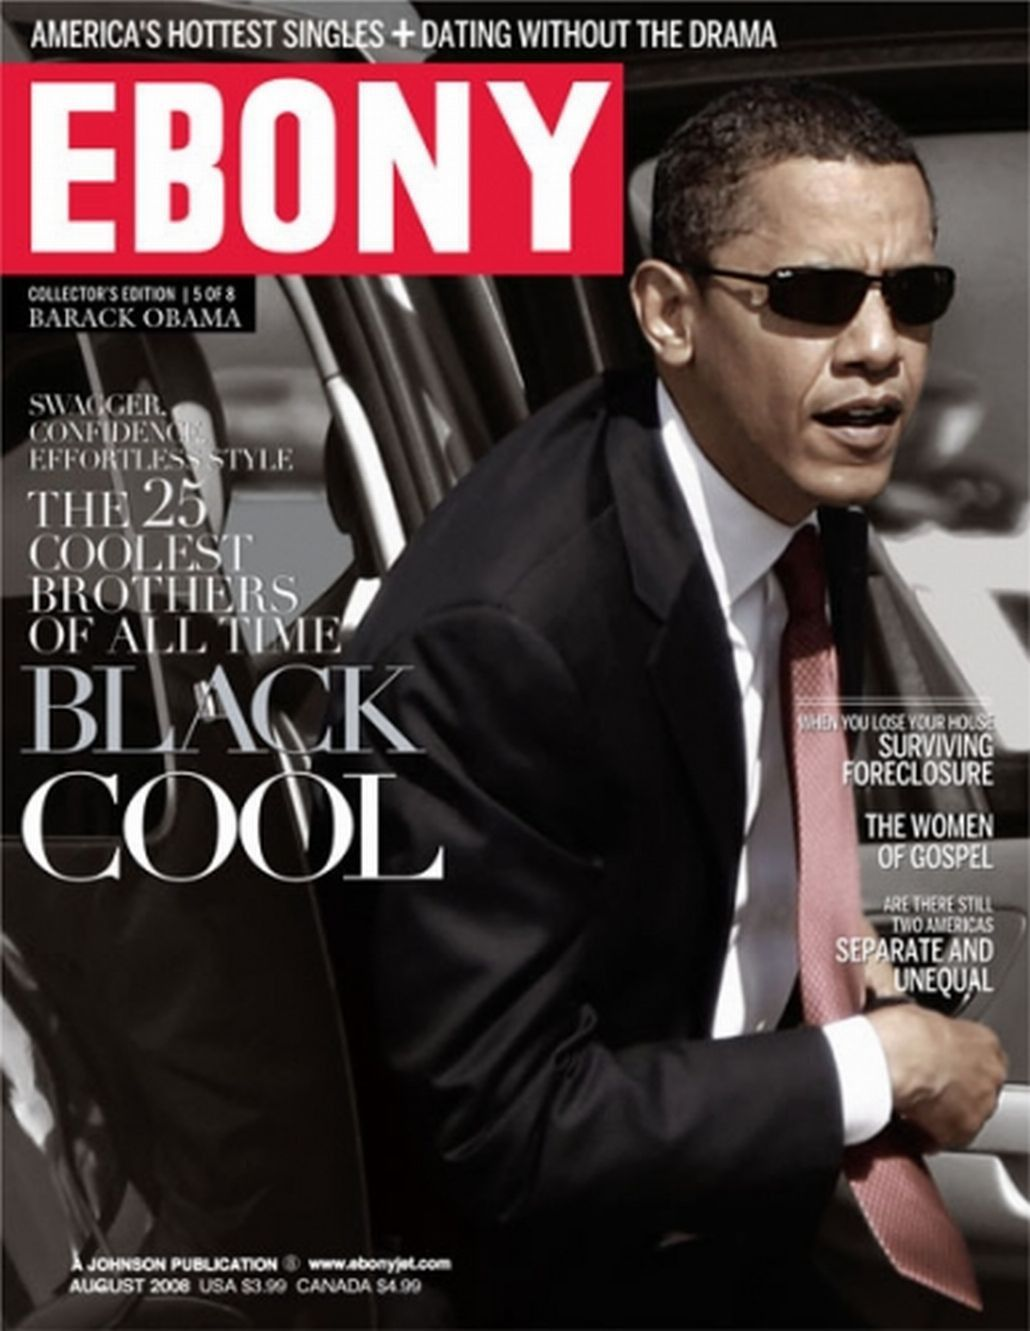 Black Cool | Obama poster, Barack obama and Obama